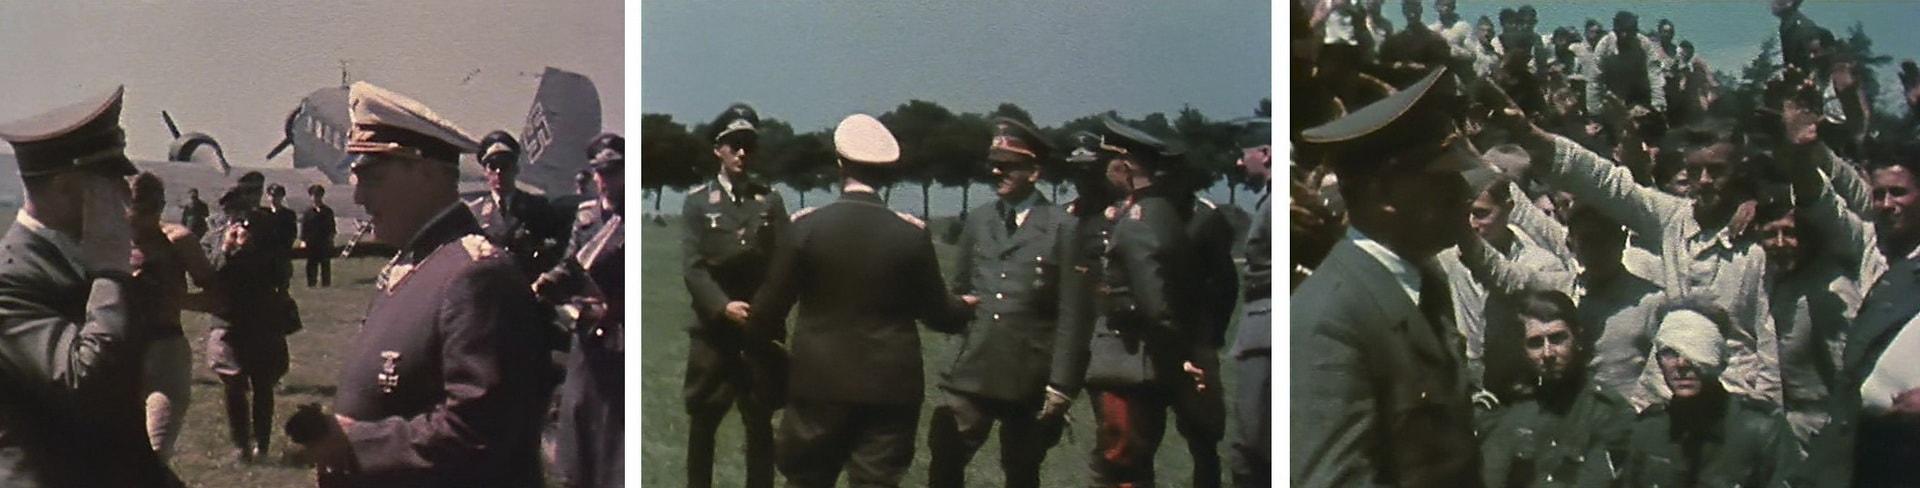 Цветная хроника, снятая пилотом Гансом Бауром